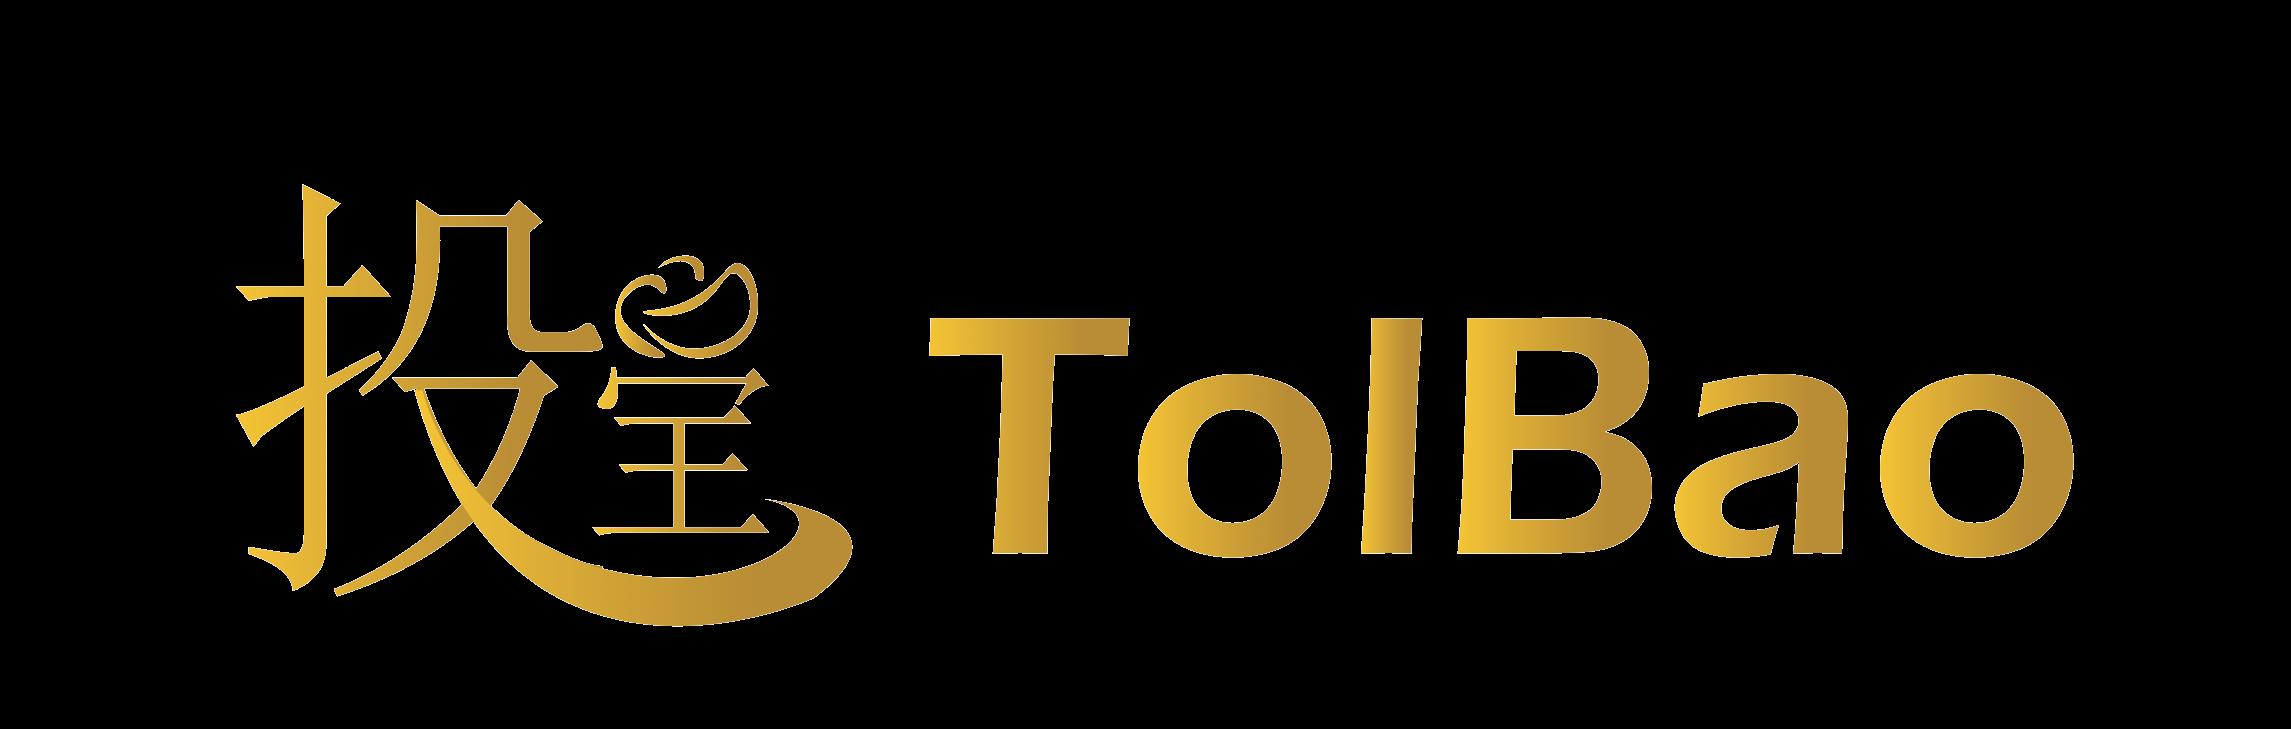 TolBao Sdn Bhd (1235627-W)